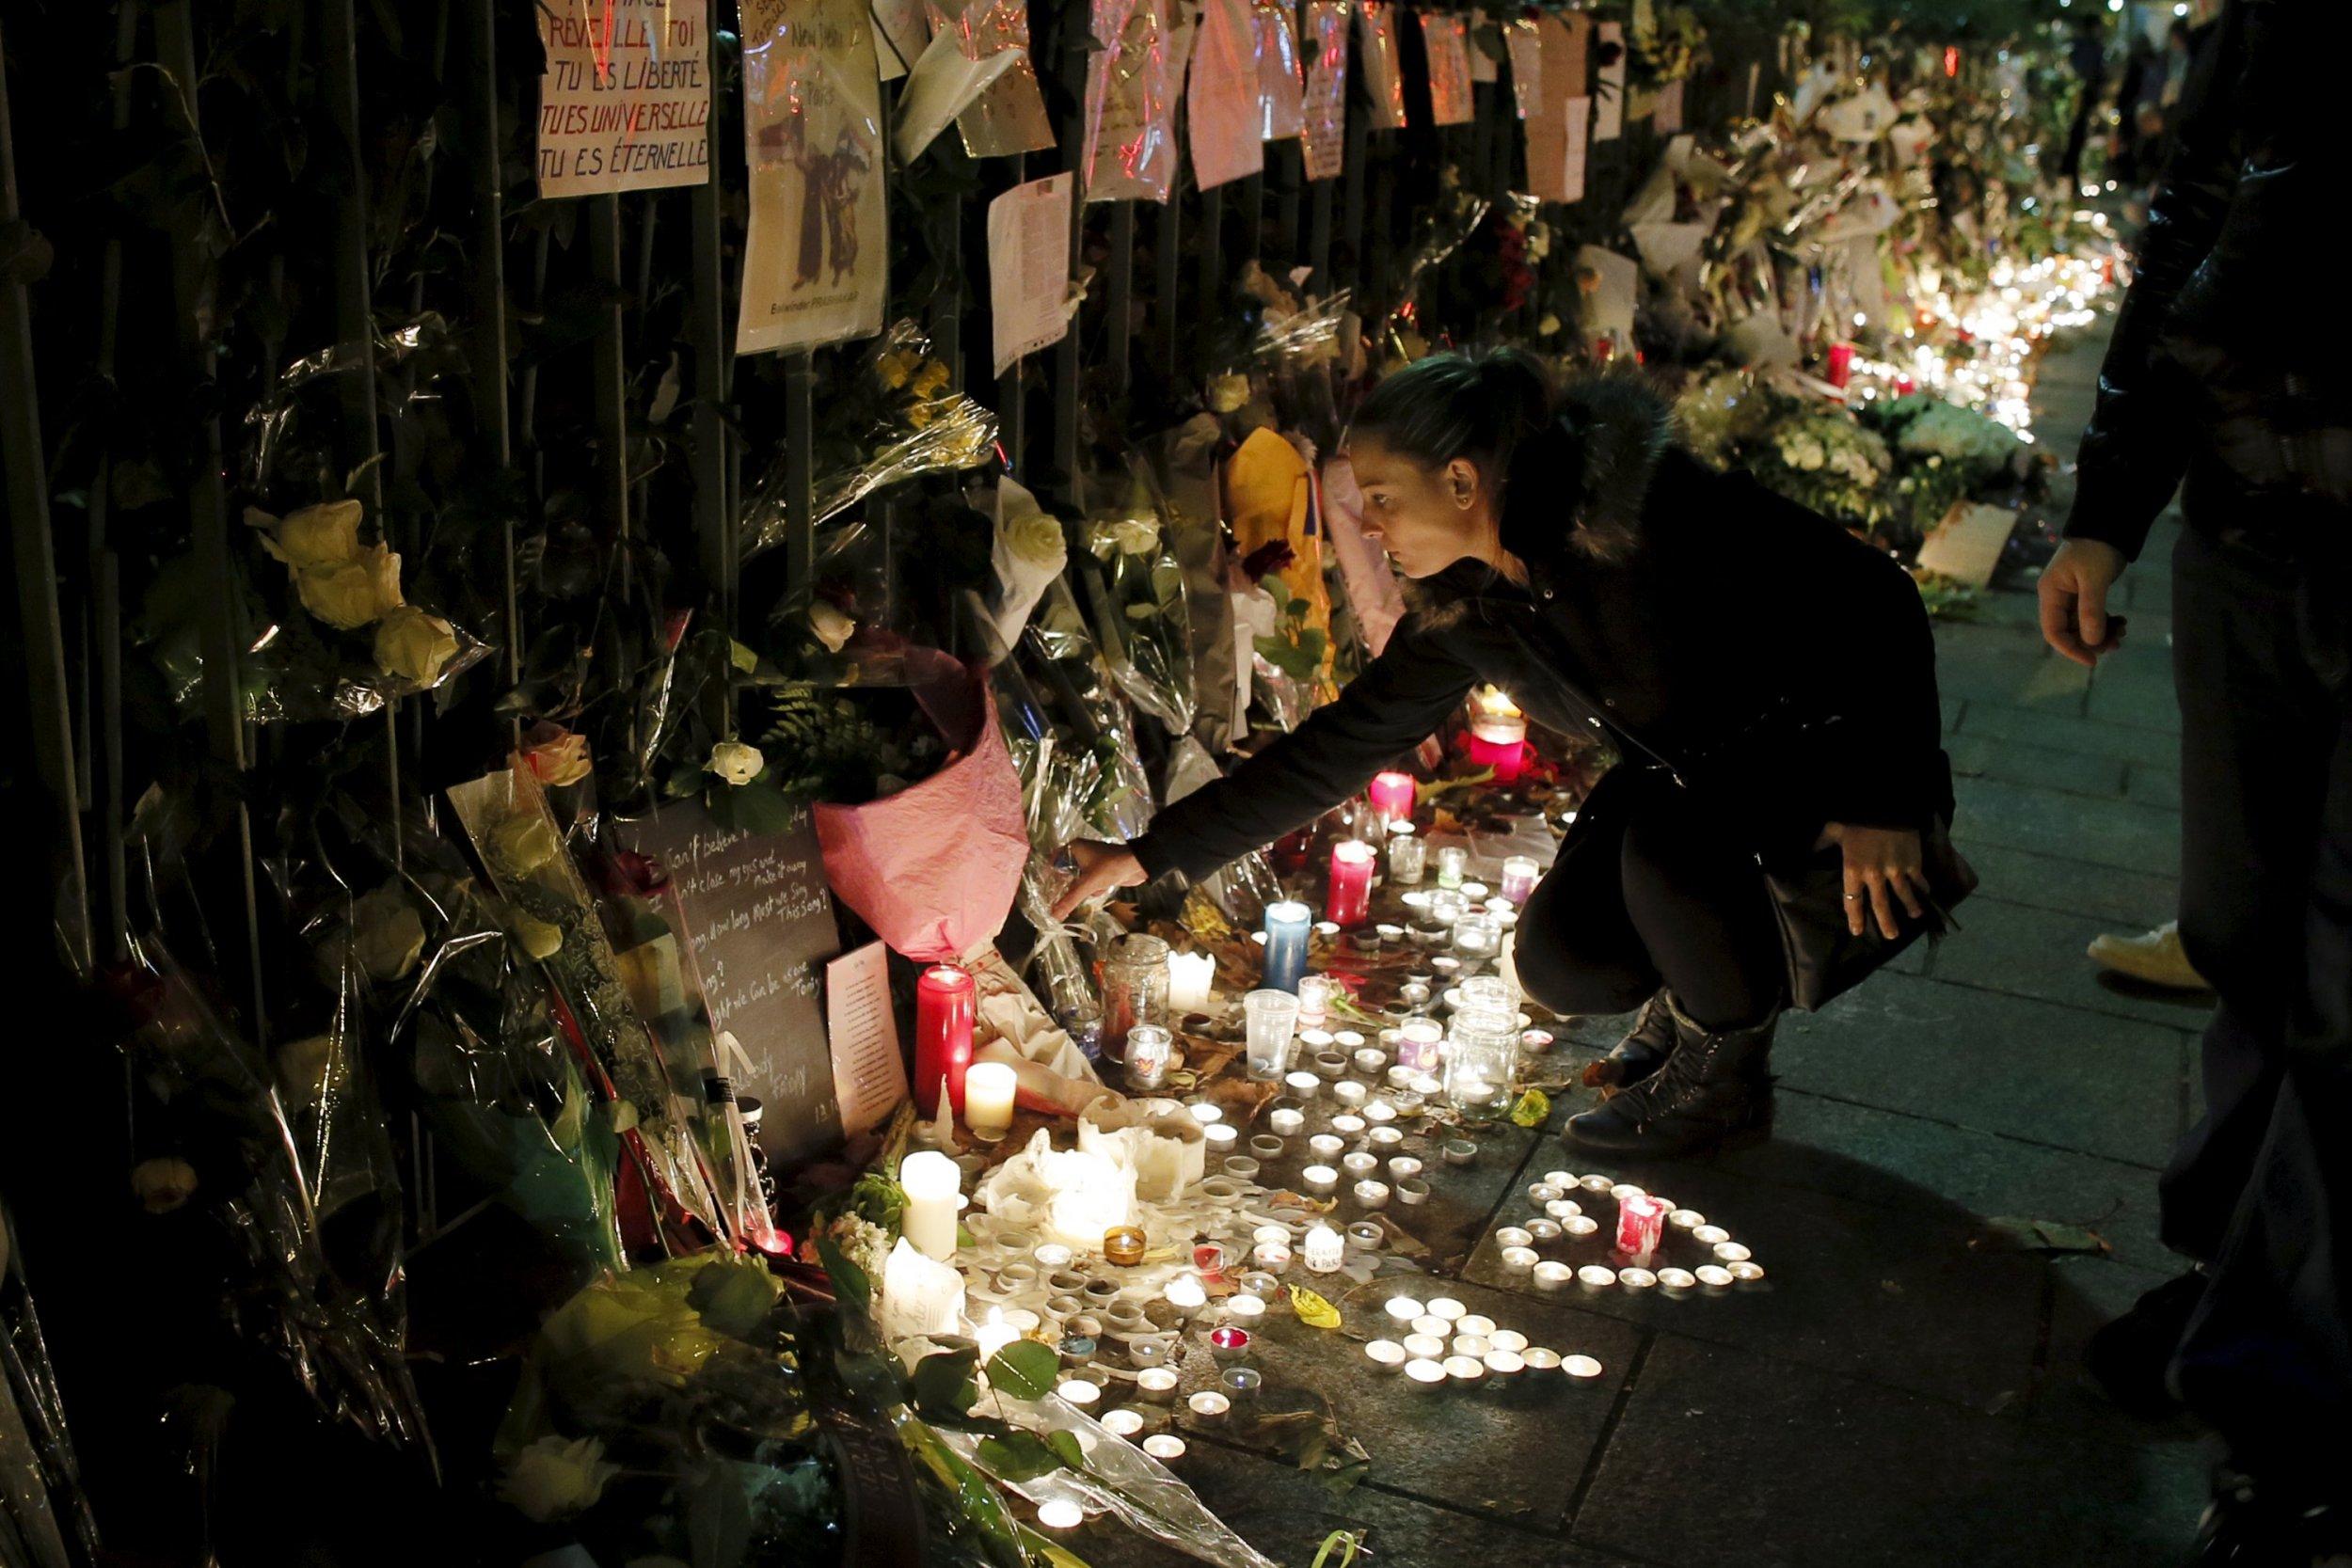 Slavoj Žižek on the Paris Attacks